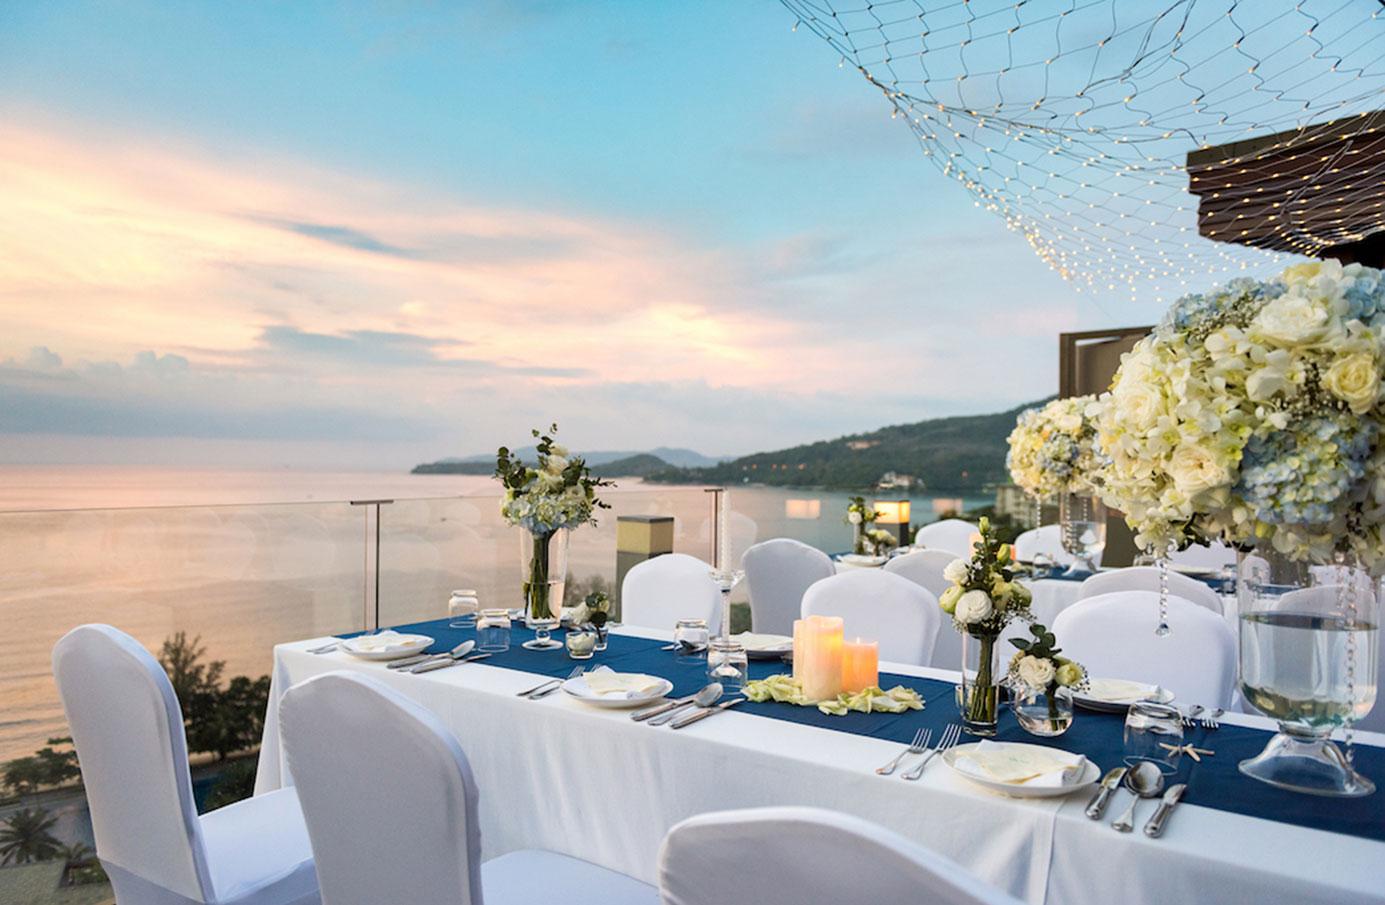 PHUHR_P257_Wedding_Dinner_Hilltop_Regency_Suite_Terrace